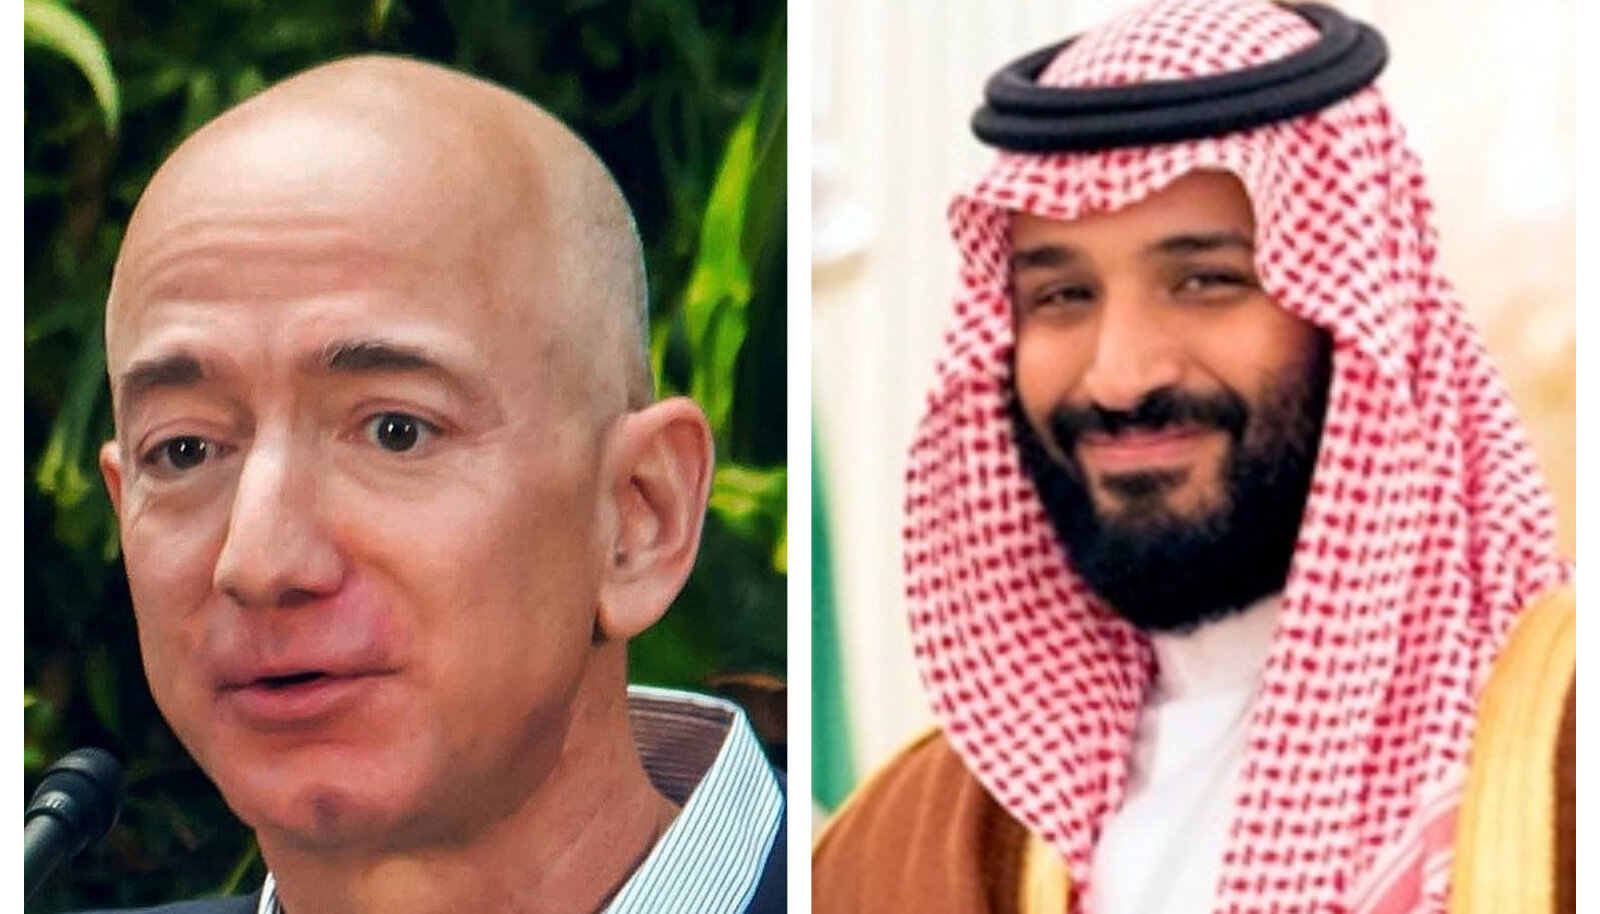 Fotokollaaž: Bezos (v) ja bin Salman (p) / vasak foto Wikimedia Commons / Seattle City Council, parem Wikimedia Commons / Valge Maja)